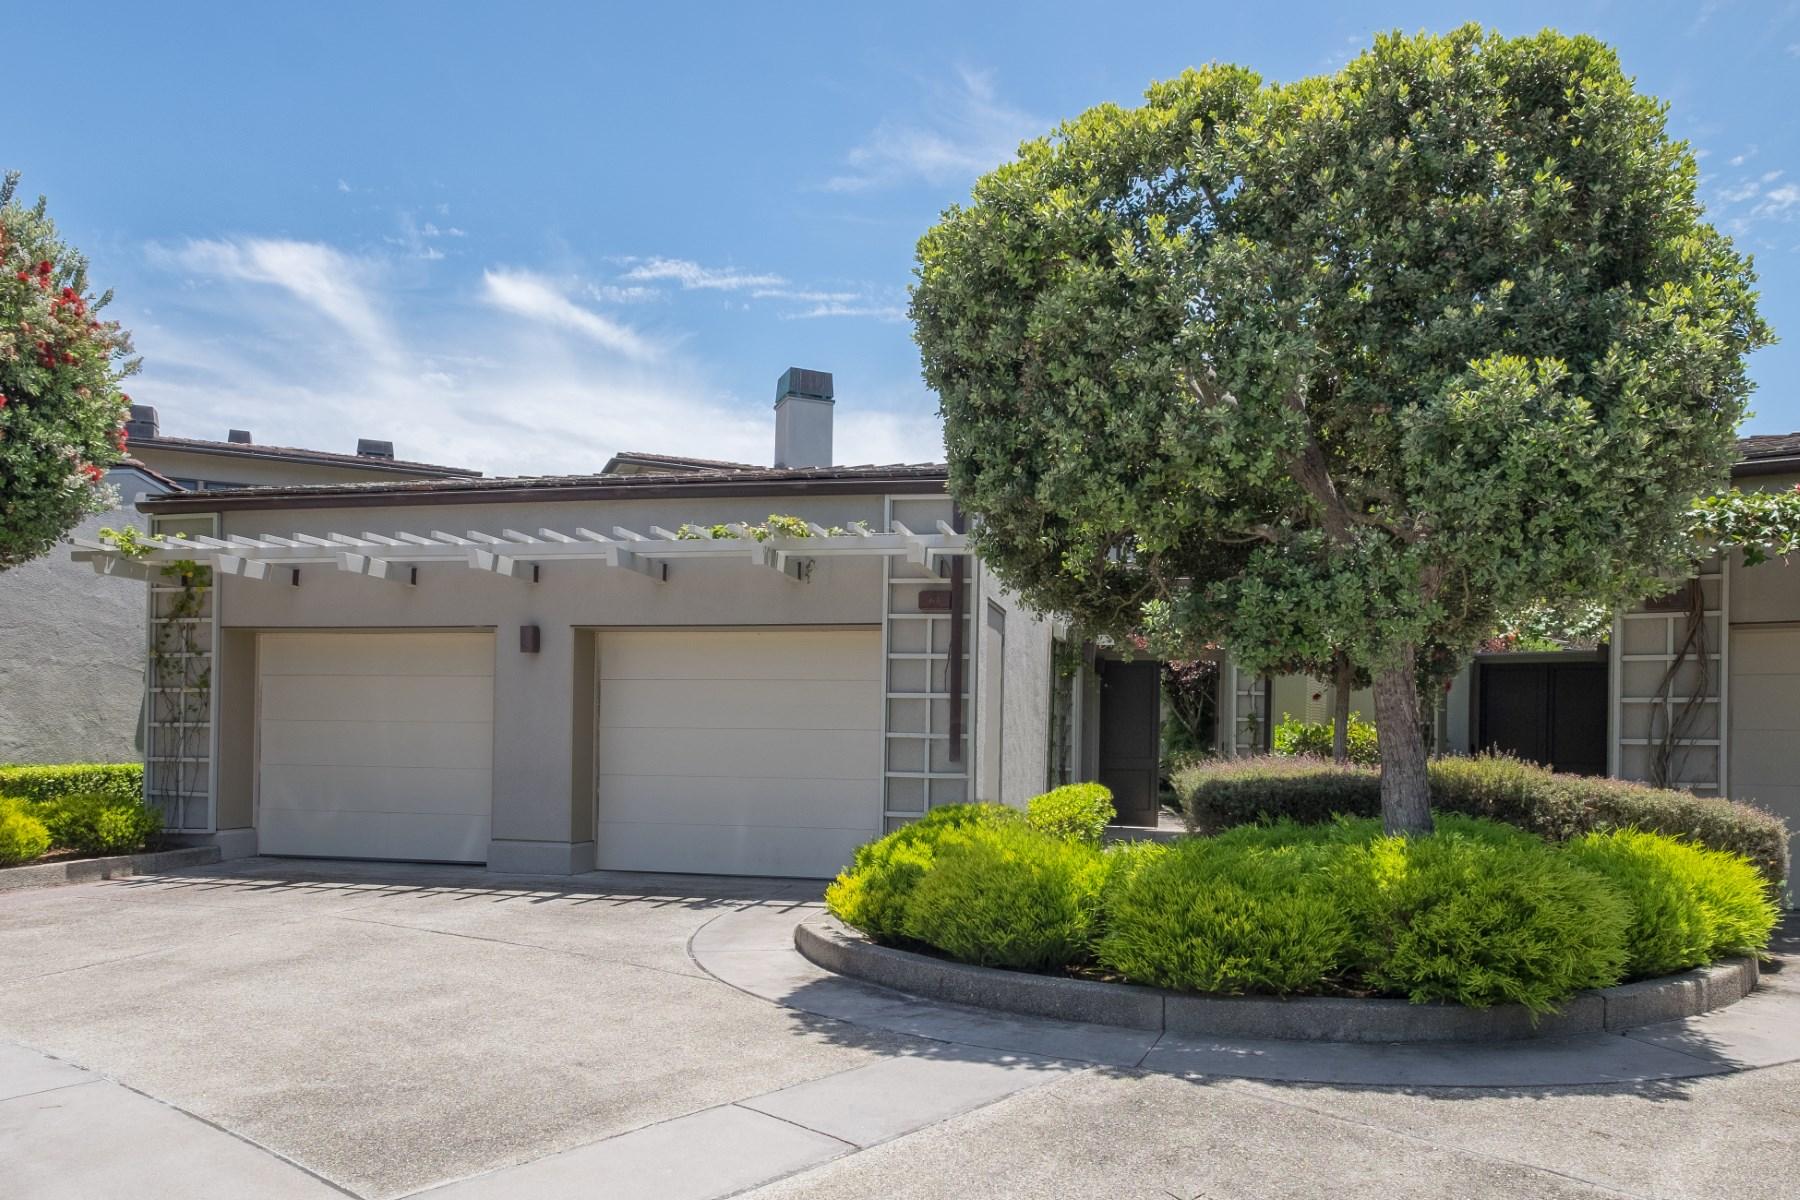 Condominium for Sale at Luxury Spanish Bay on the 12th Tee 63 Spanish Bay Circle Pebble Beach, California, 93953 United States